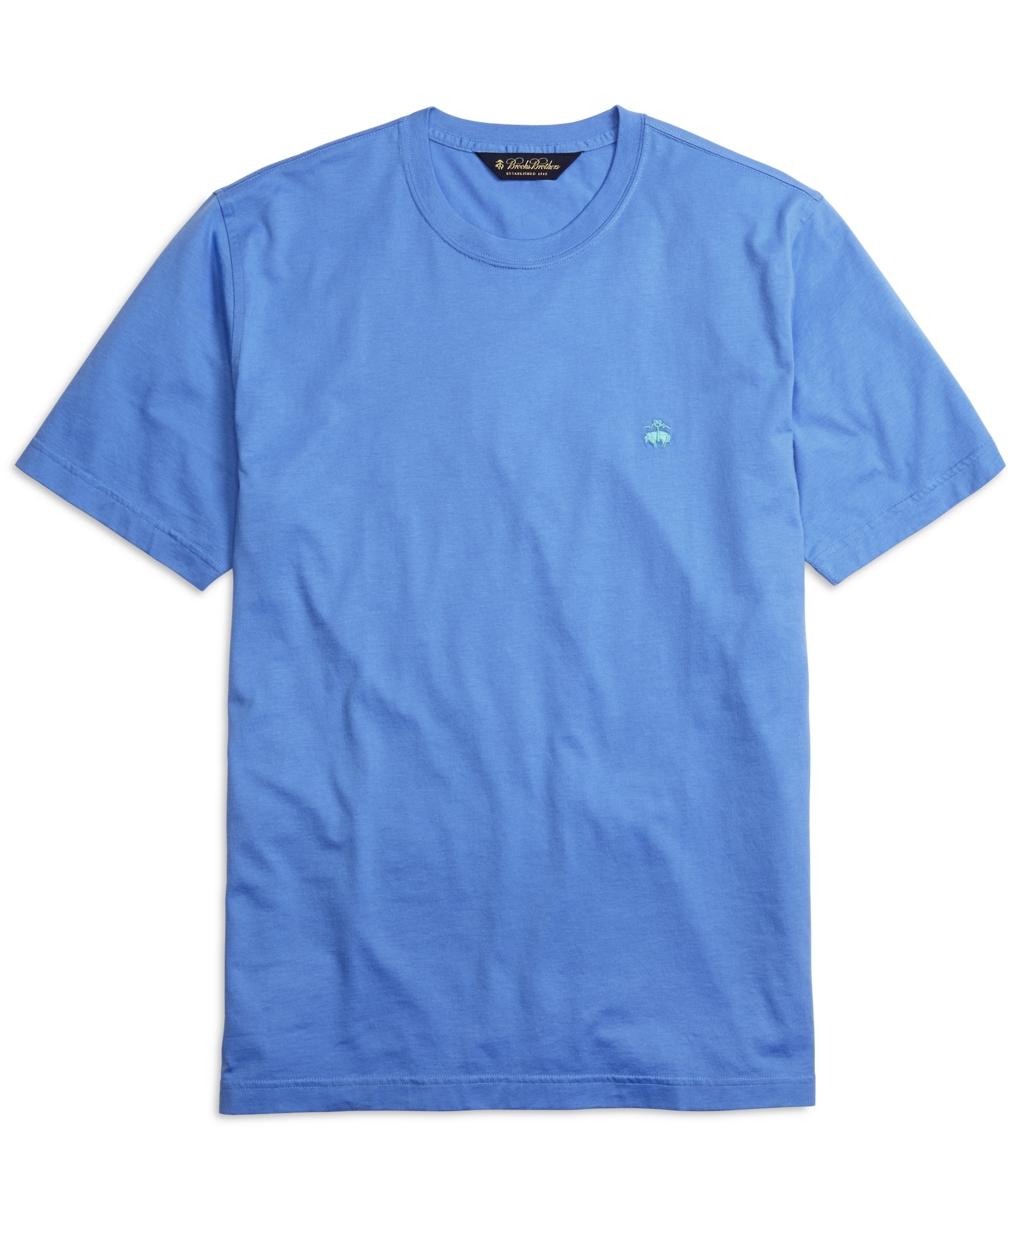 Brooks brothers supima cotton crewneck tee shirt in blue for Supima cotton dress shirts